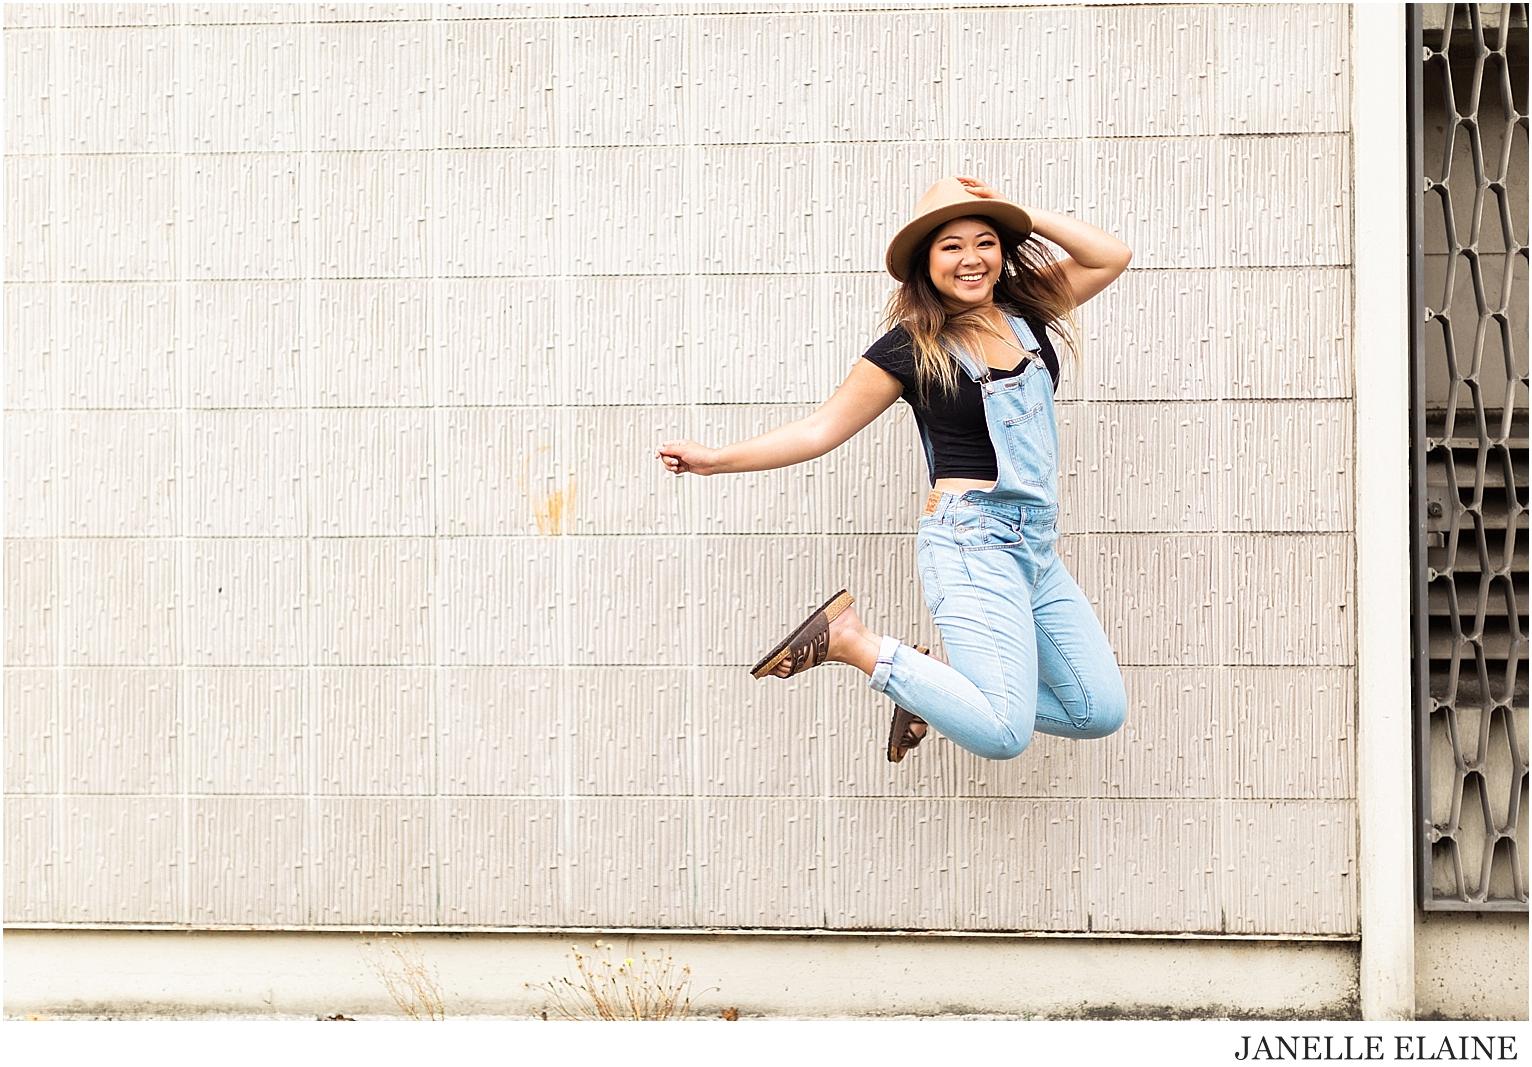 Aiko-Seattle WA-lifestyle photoshoot-Renton-Janelle Elaine Photography-16.jpg